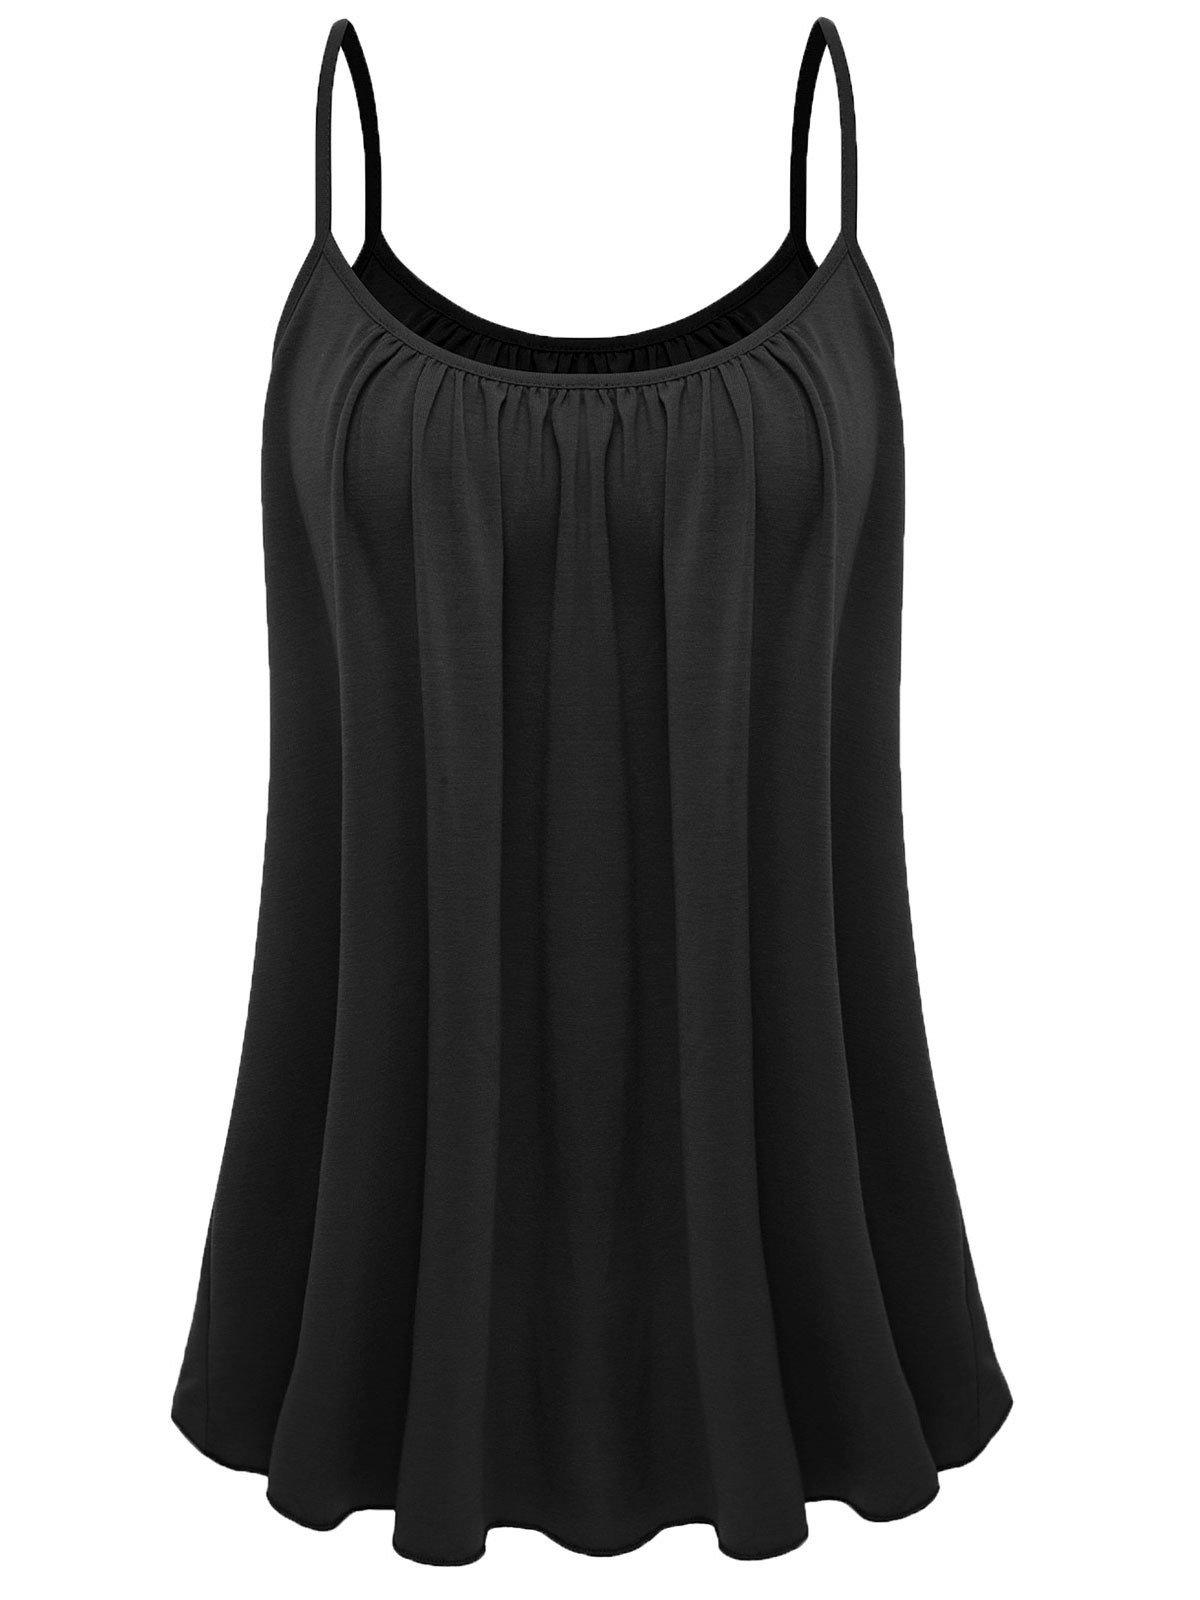 7th Element Womens Plus Size Cami Basic Camisole Tank Top (Black,2XL)